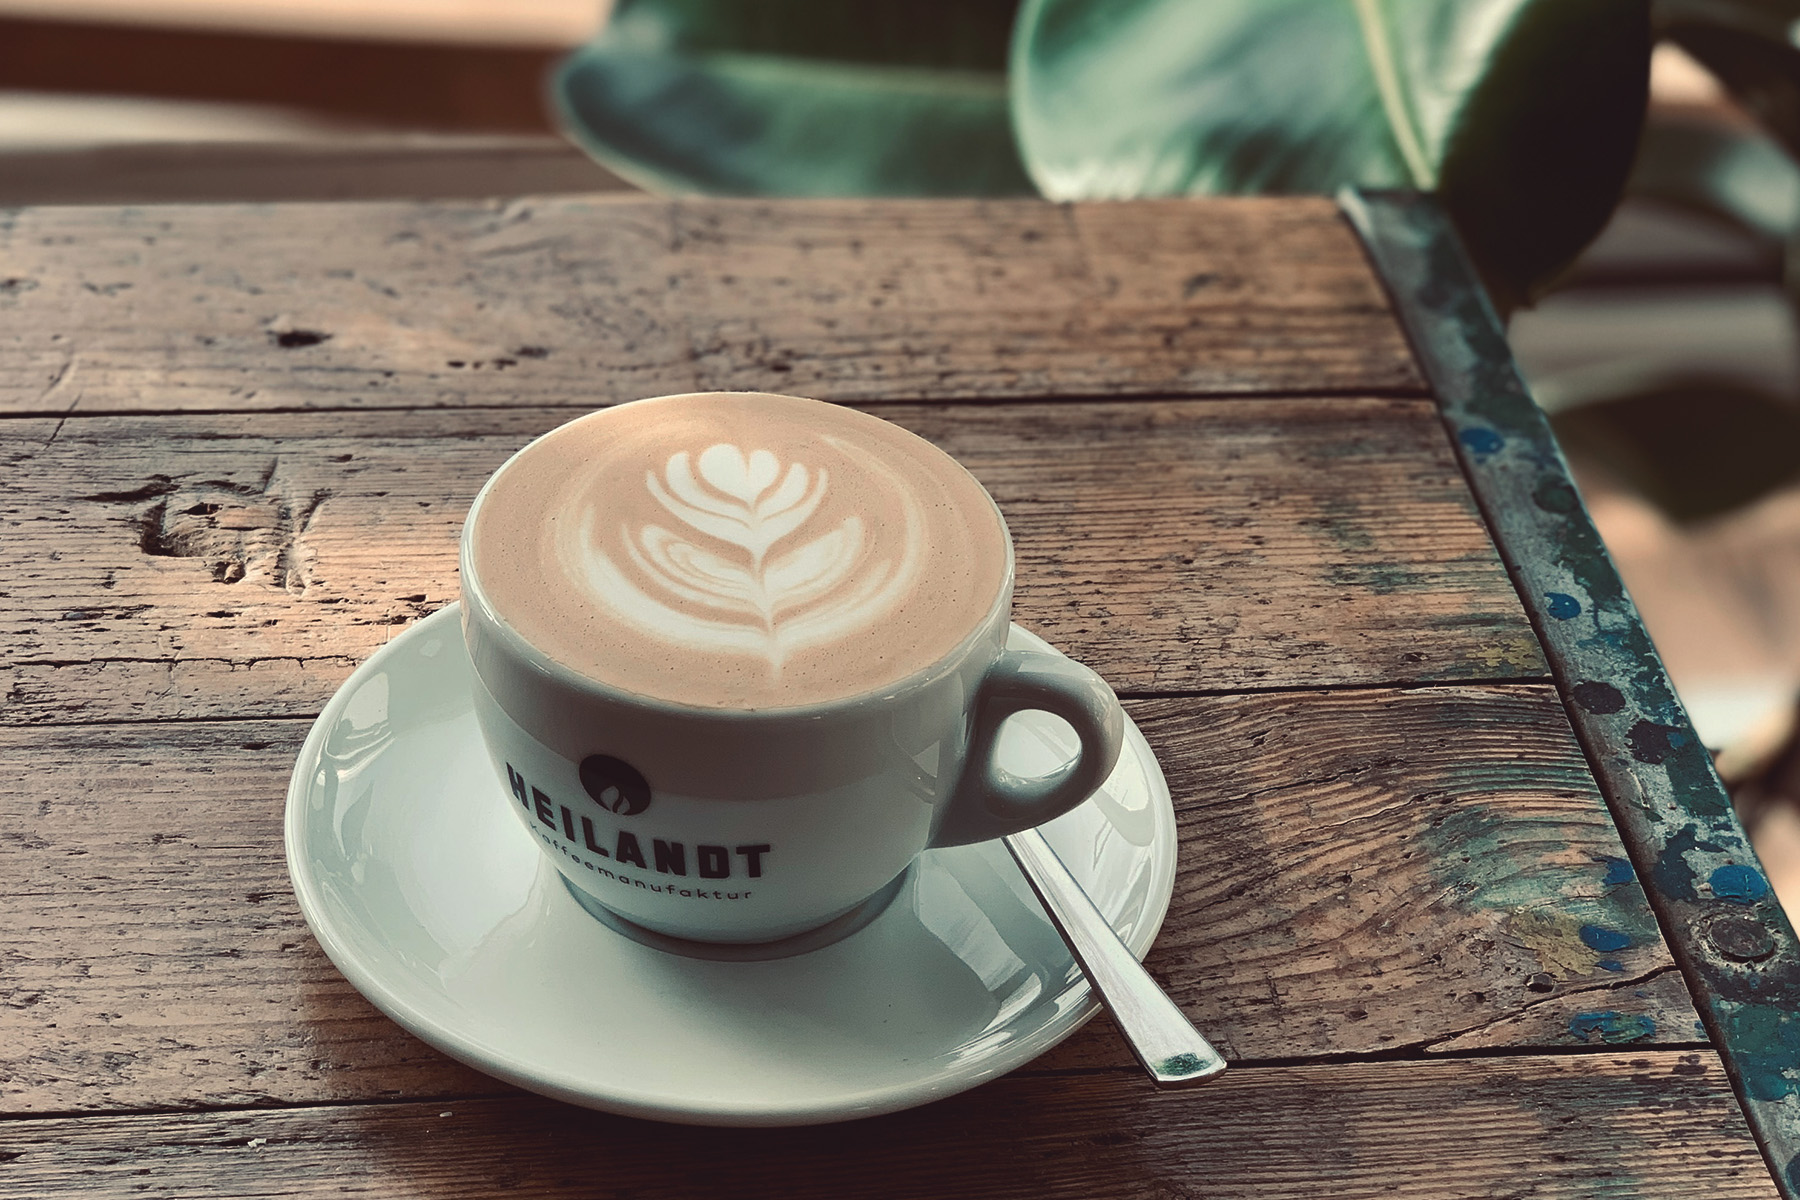 Heilandt, Kaffee – ©Heilandt